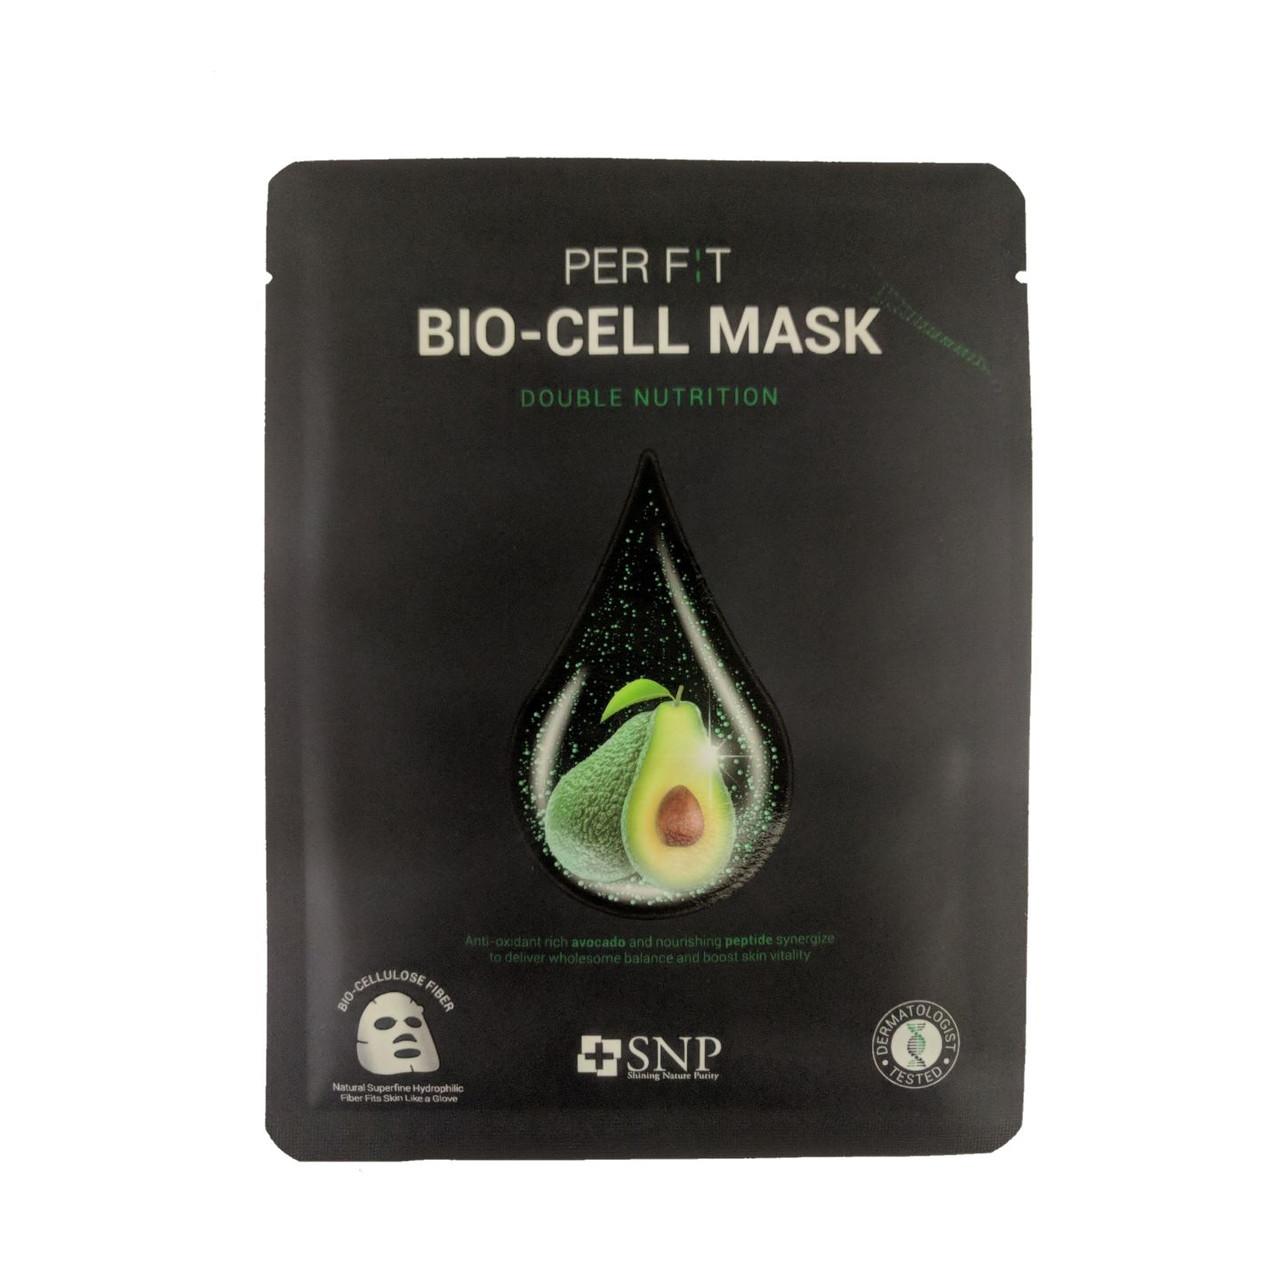 Биоцеллюлозная увлажняющая маска для лица с масла авокадо SNP Double Nutrition Bio-cell Mask 25 мл (8809458846954)